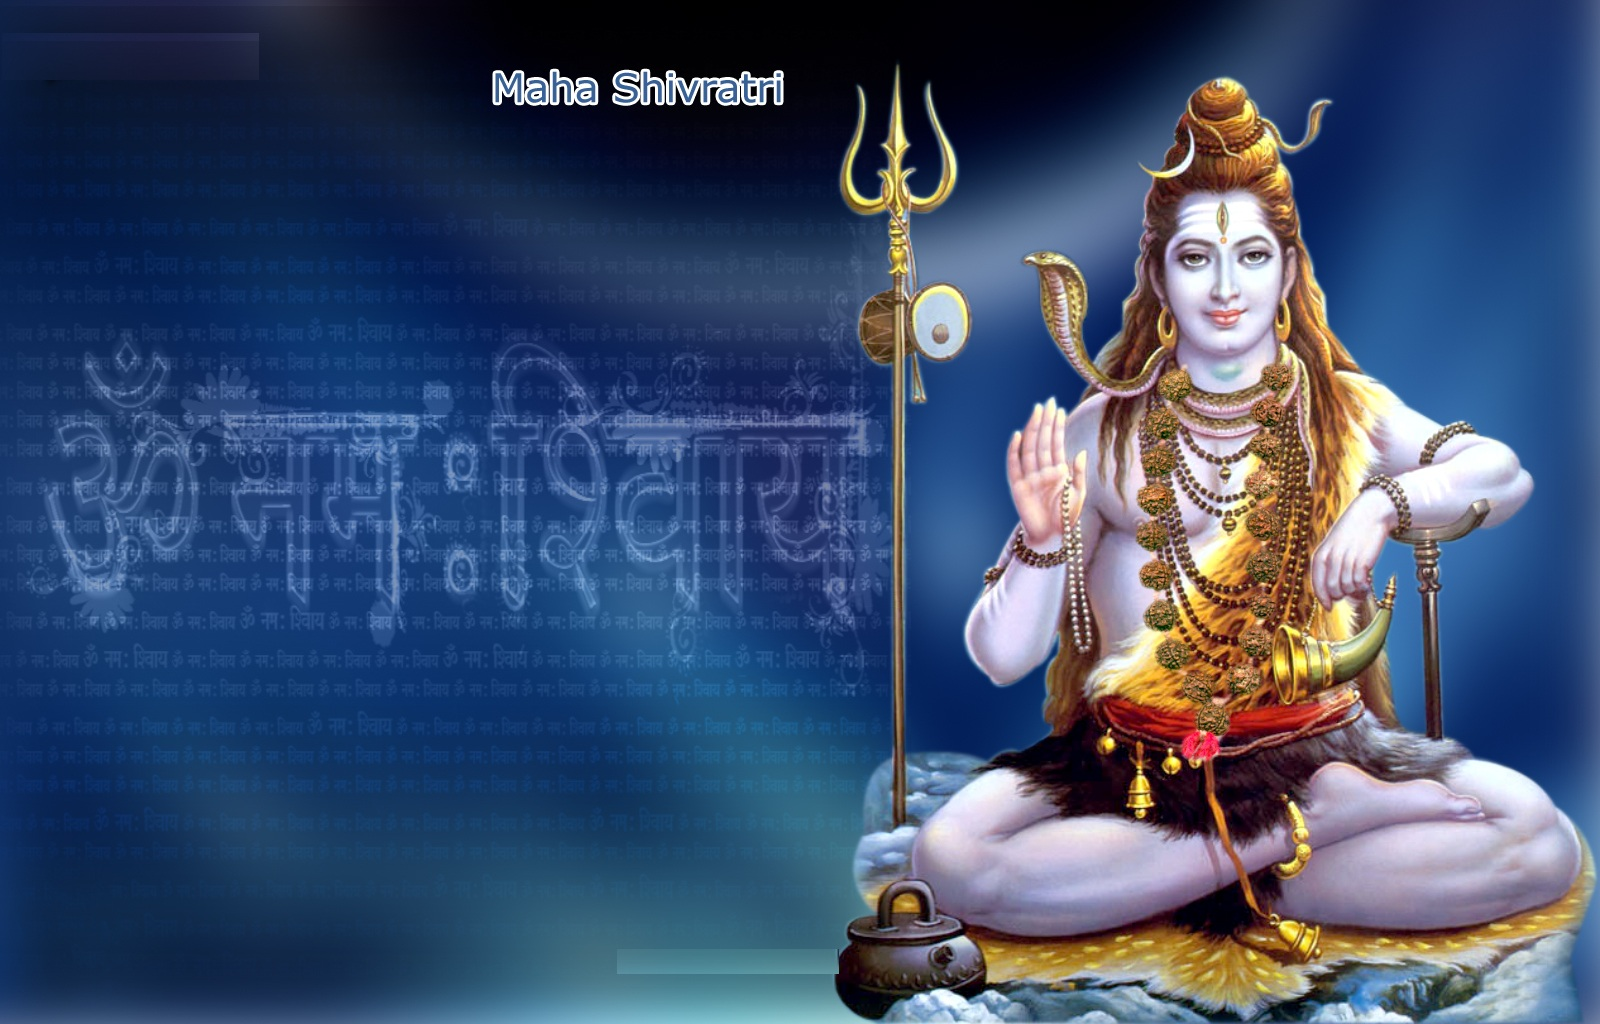 Maha-Shivratri-3439